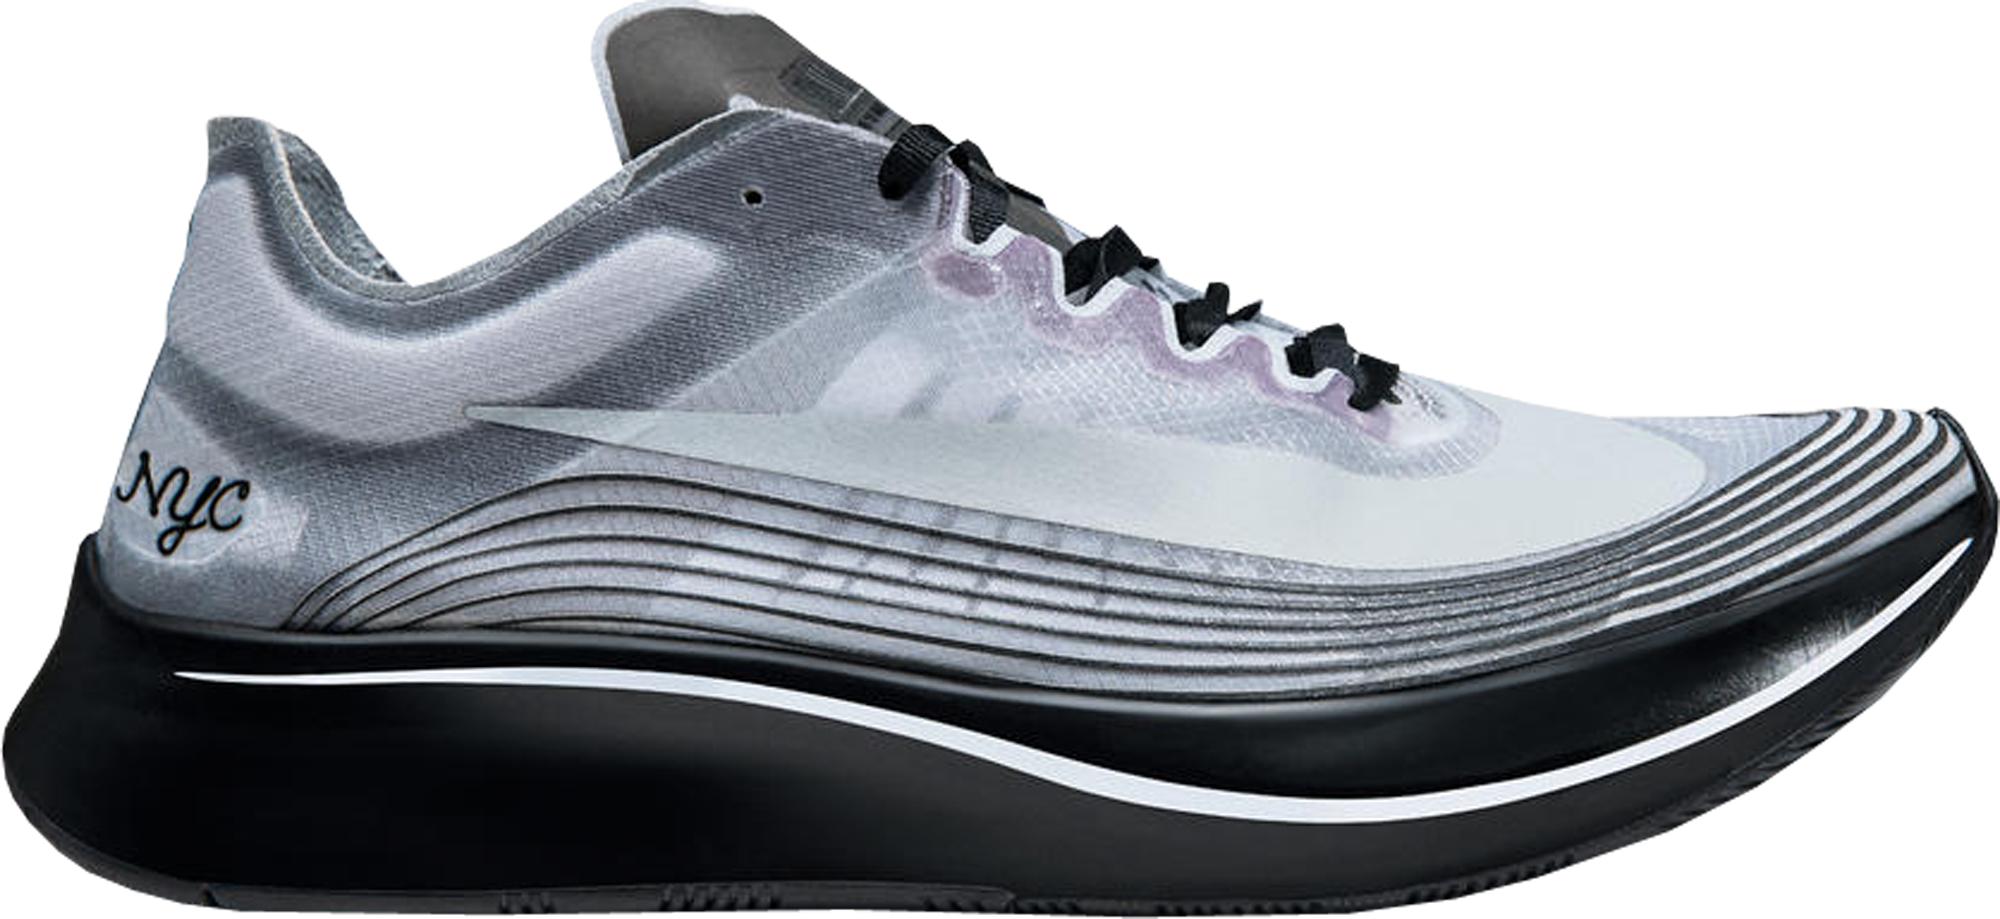 Nike Zoom Fly NYC - AH5088-001